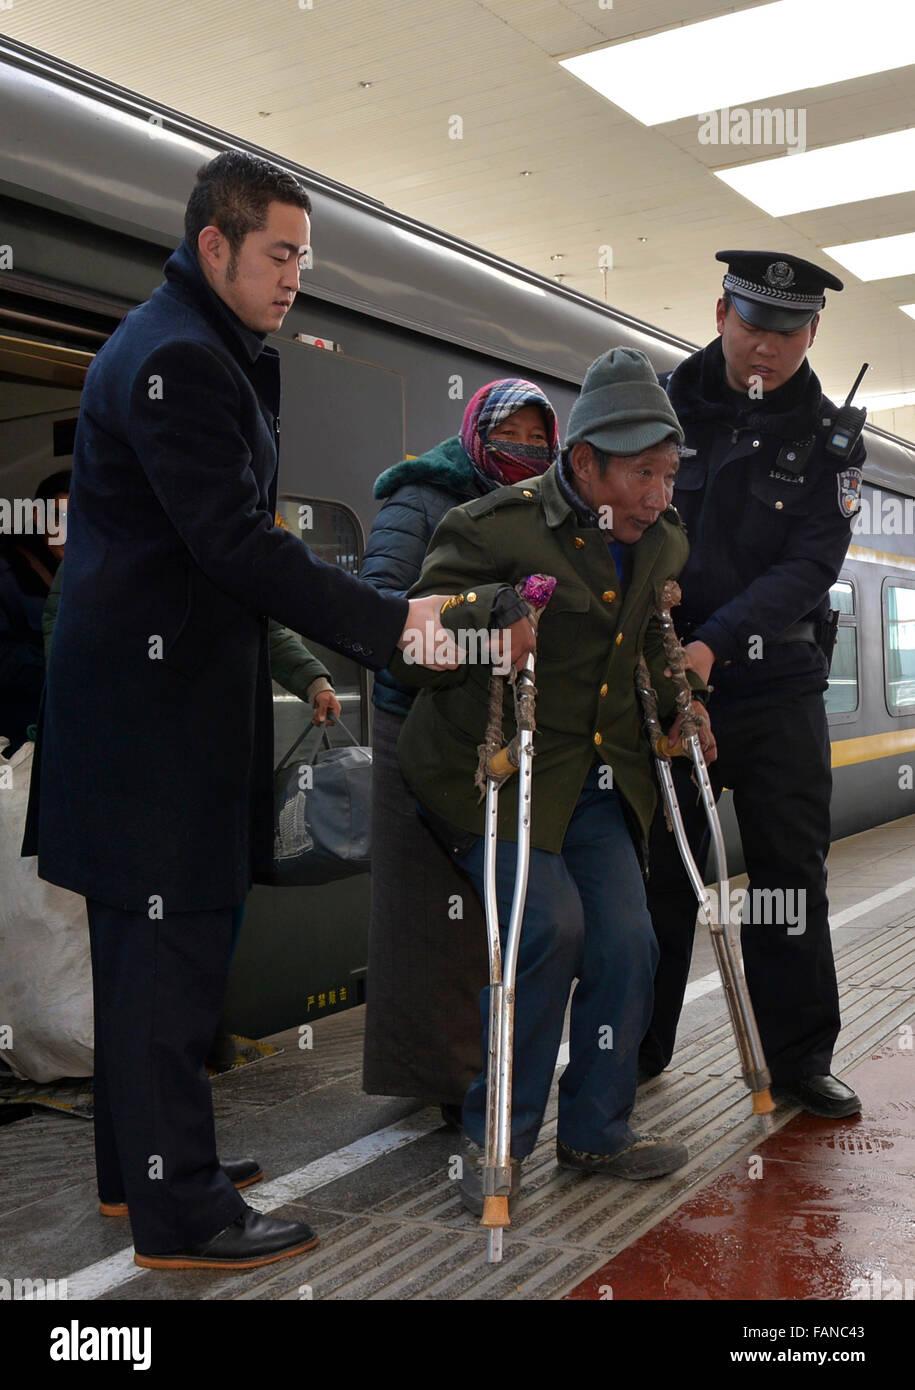 Lhasa, China's Tibet Autonomous Region. 2nd Jan, 2016. Crew members help a senior passenger at a train station - Stock Image